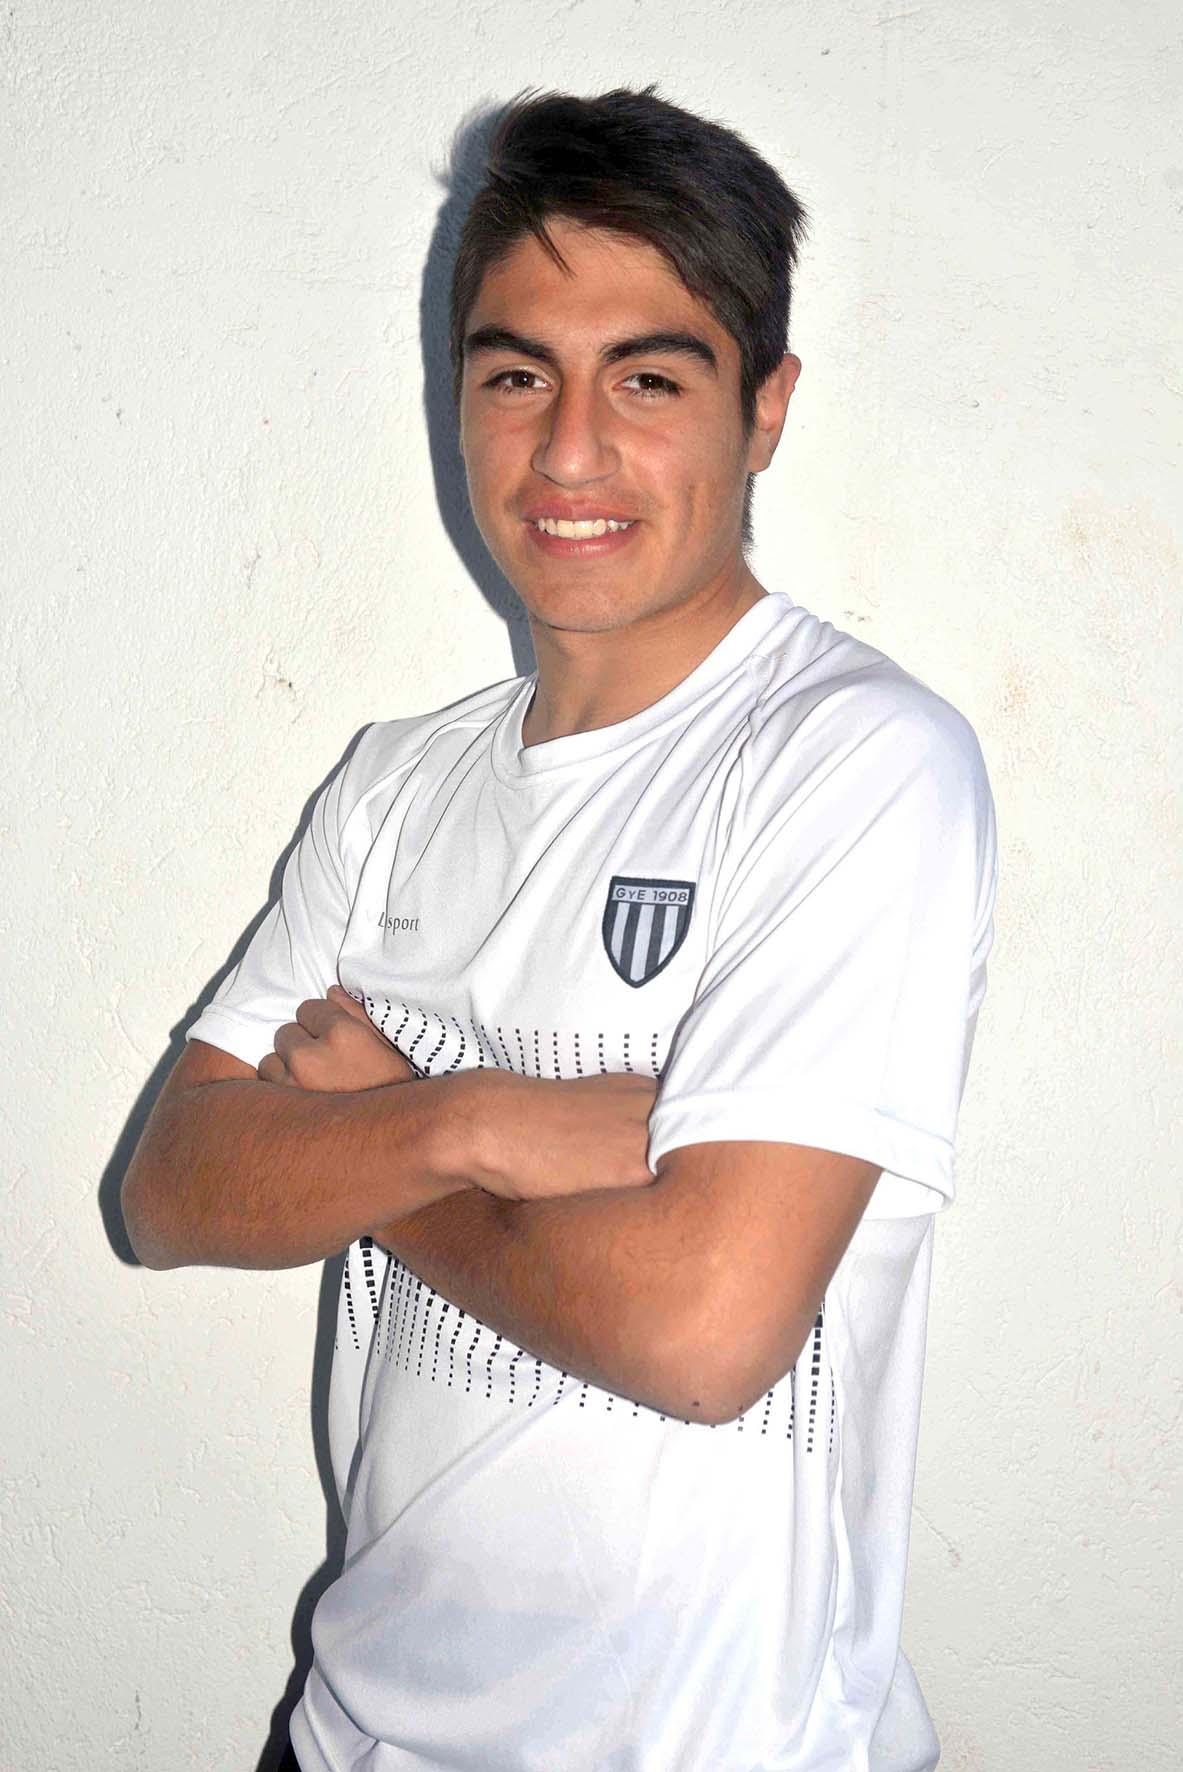 Emanuel Gutiérrez